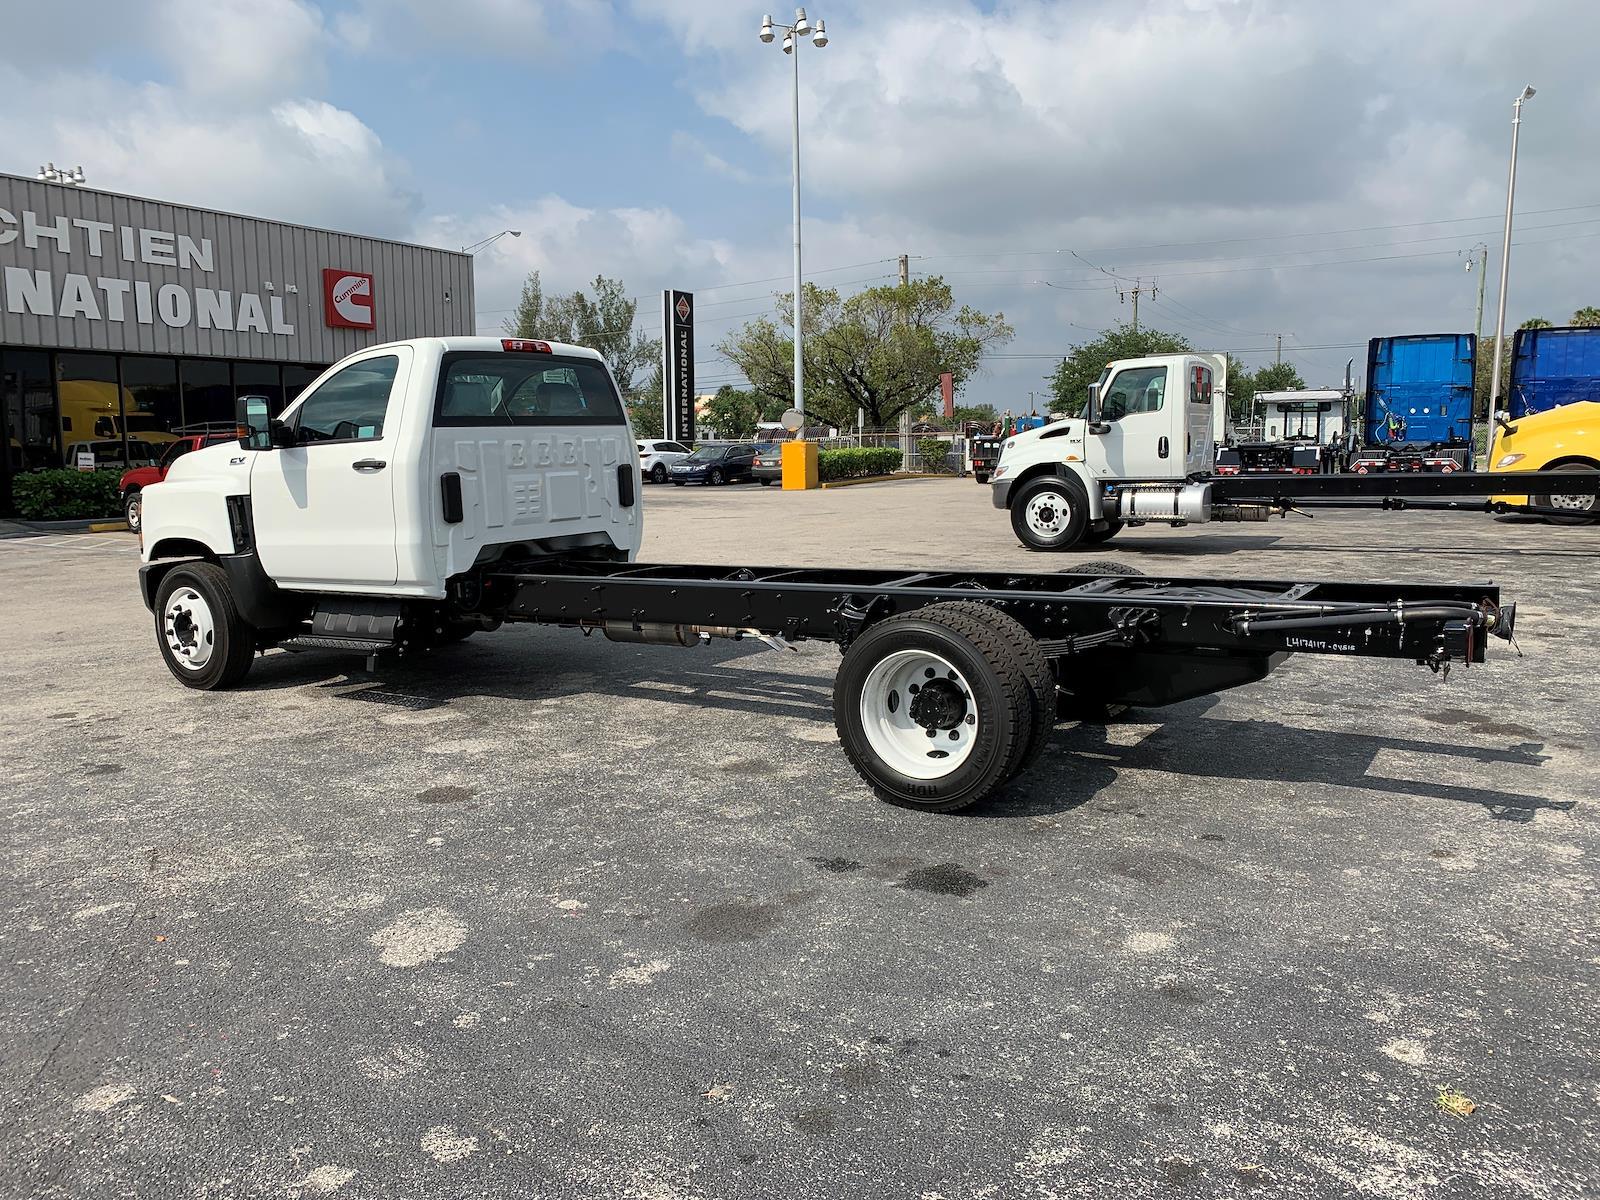 2022 International CV 4x4, Cab Chassis #PR-541855 - photo 1